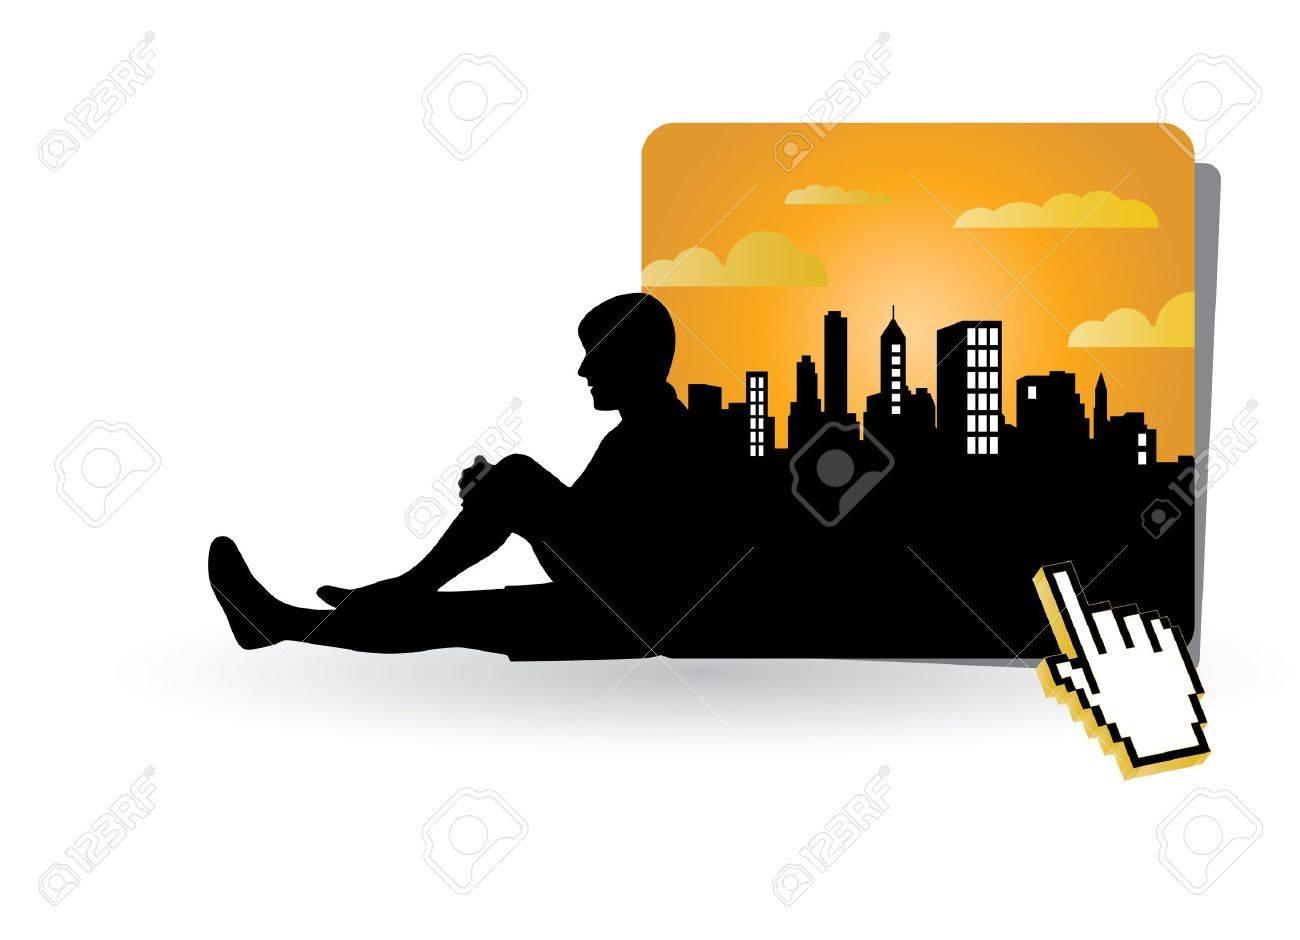 Tourist Travelers Men Stock Vector - 9868974